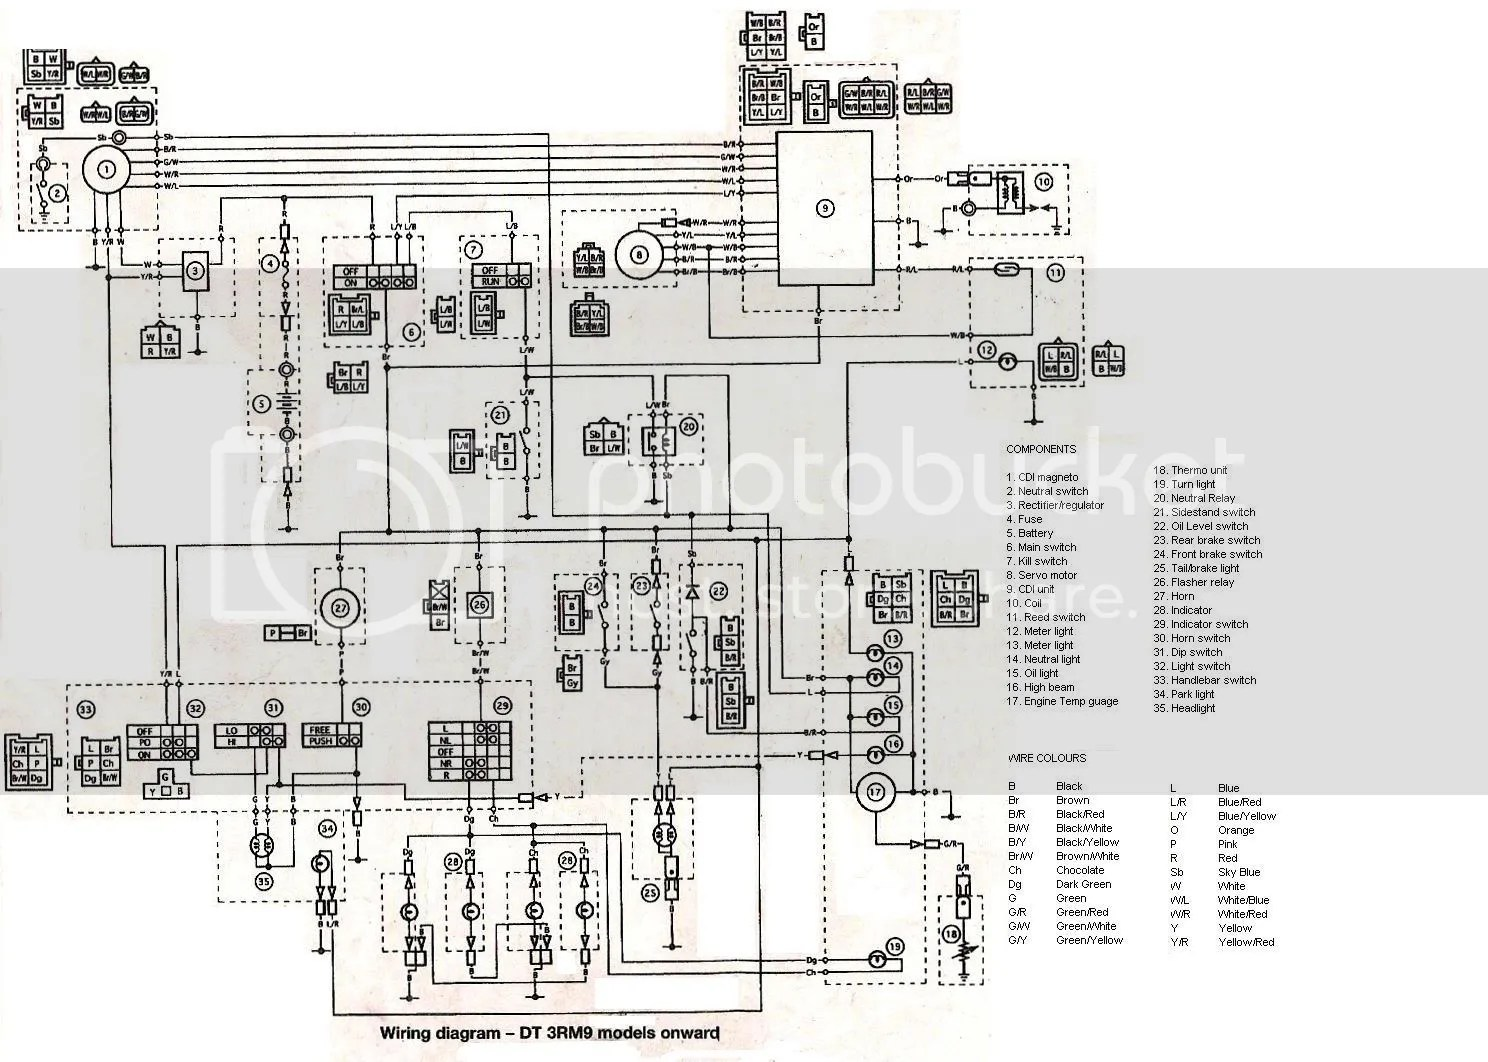 medium resolution of handlebar wiring diagrams general wiring diagram view handlebar wiring diagrams general